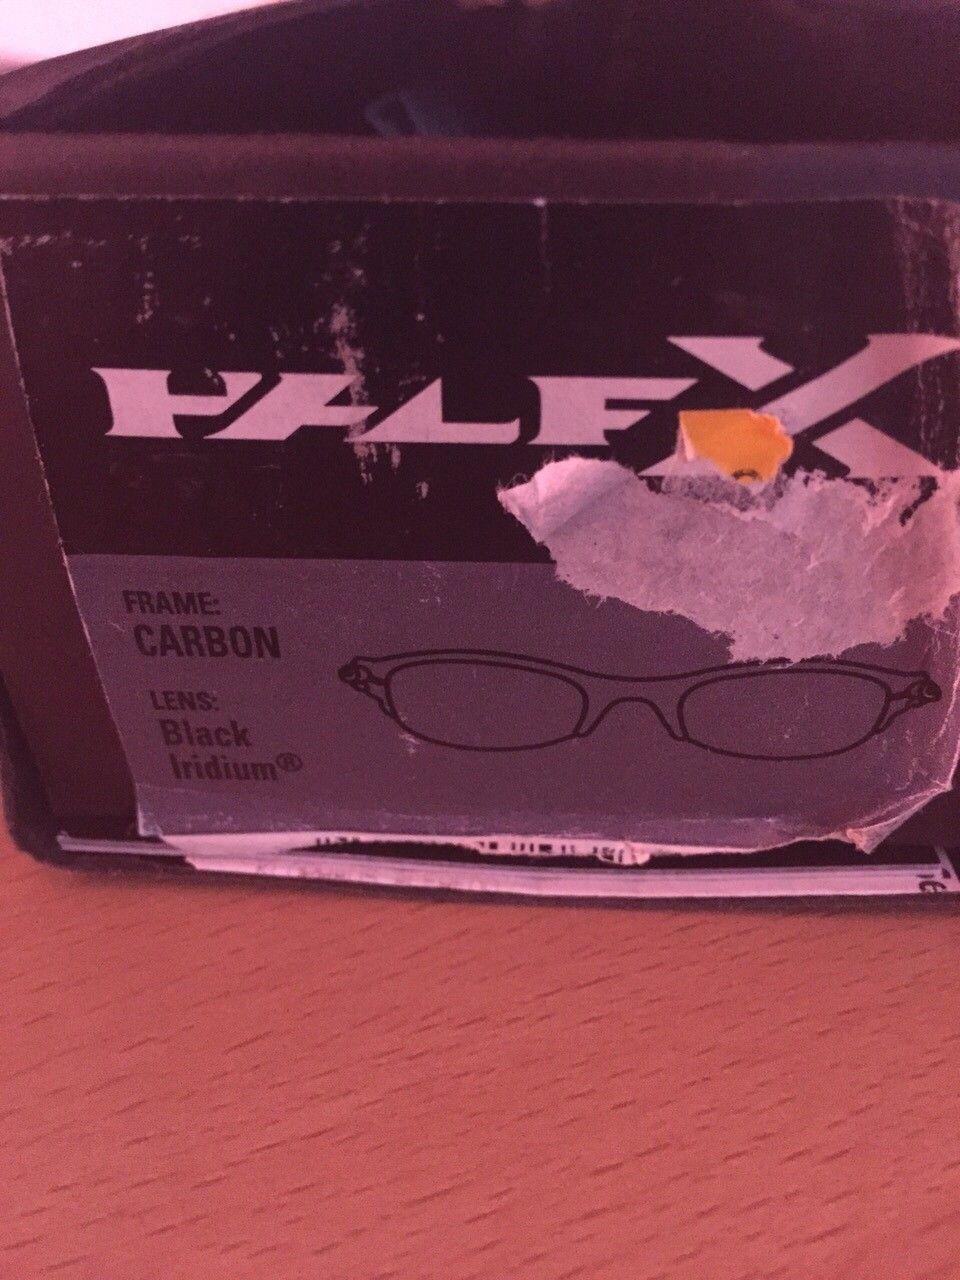 Half X carbon / black iridium *** SOLD *** - image.jpg